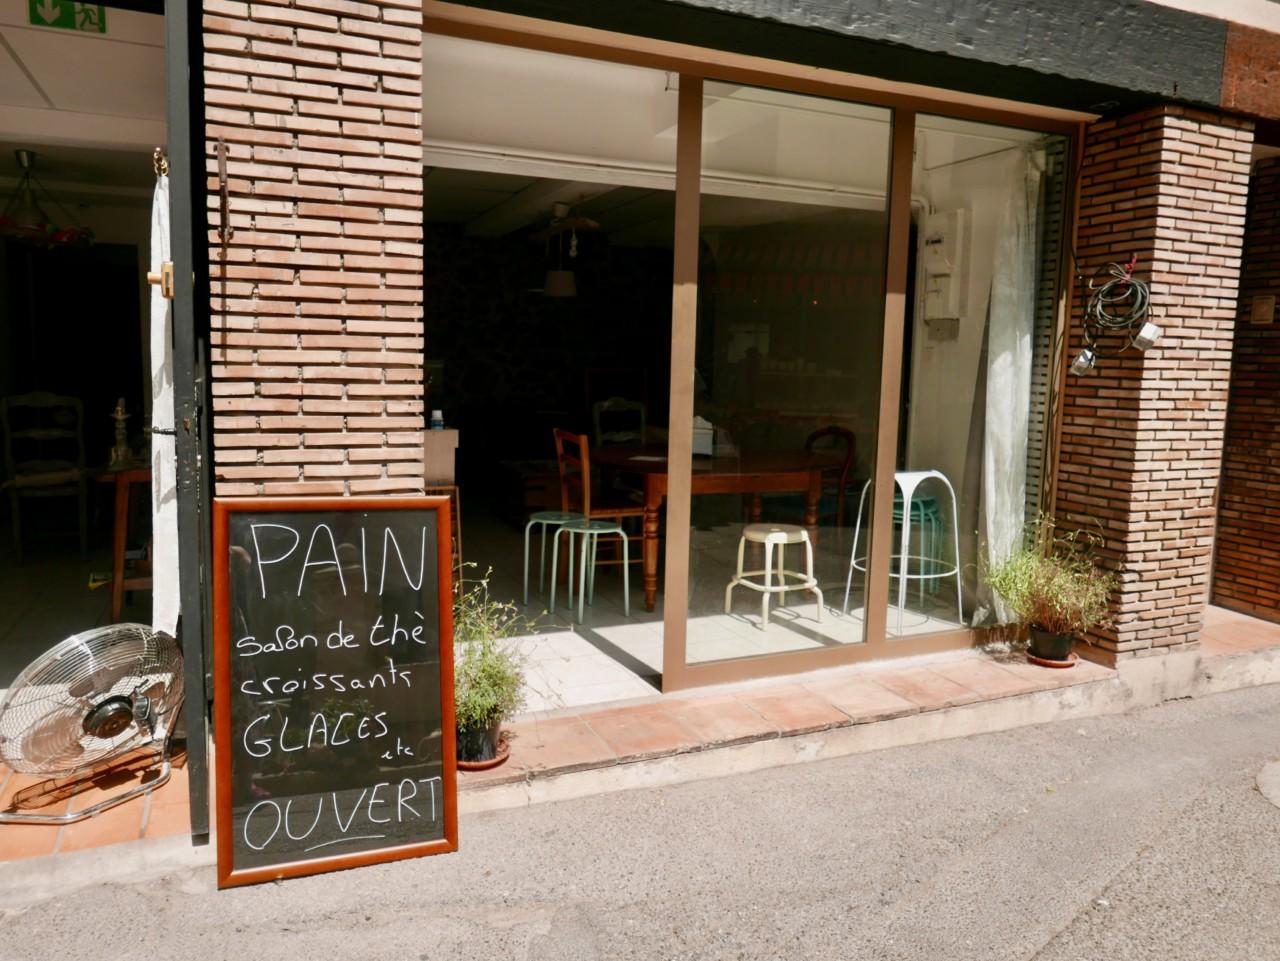 baker-salon-de-the-patisserie-st-jeannet-frankrike